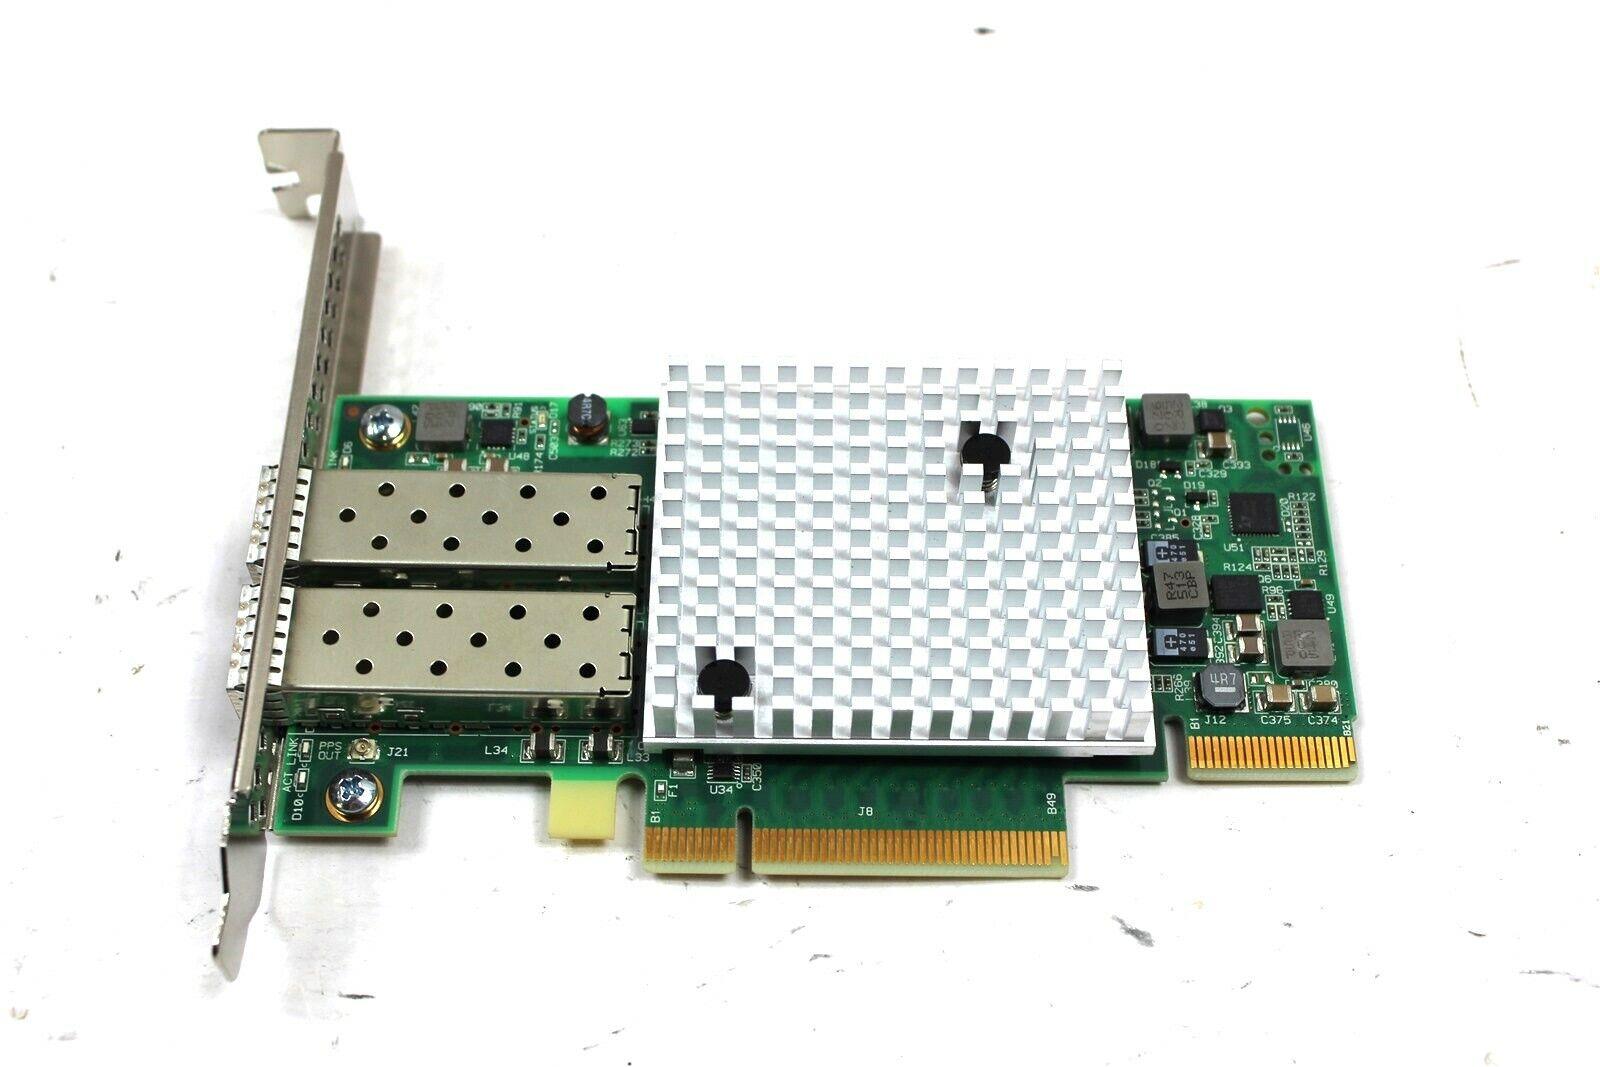 Solarflare SFN5322F Dual Port 10GbE PCI-E Server Cardwith Low profile bracket